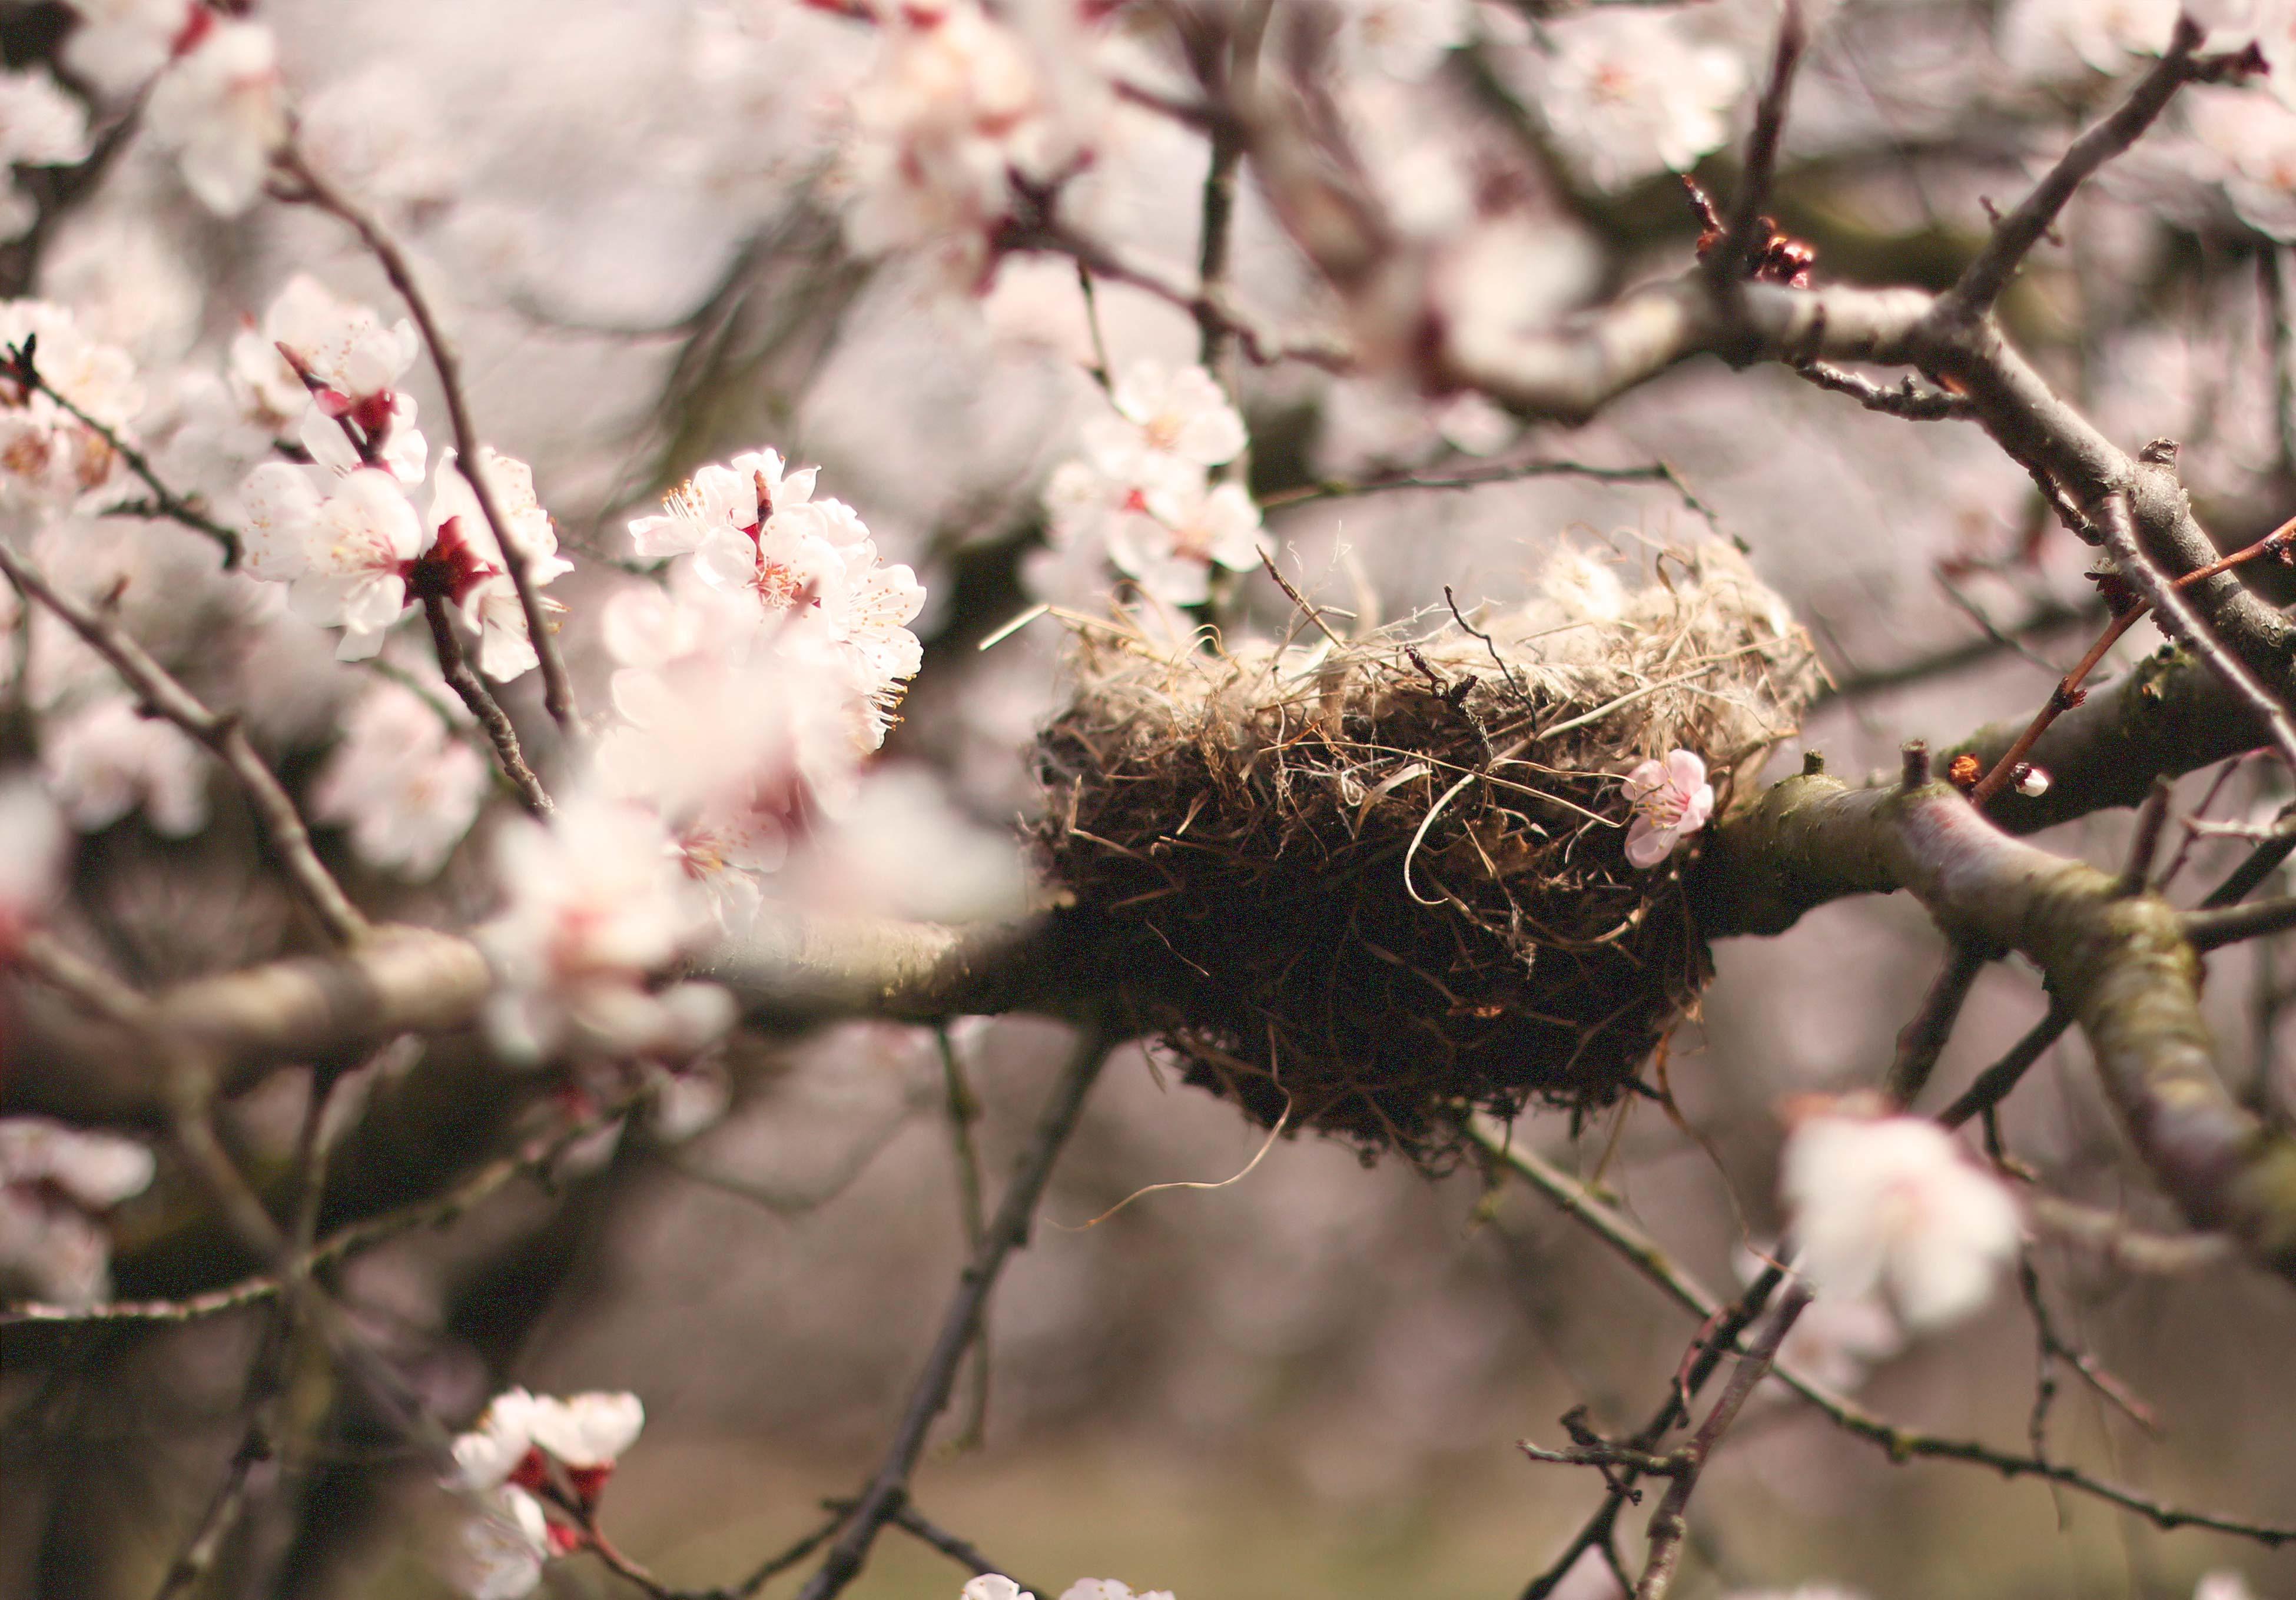 madarbarat_birdsnest_apricot_orchard_csi